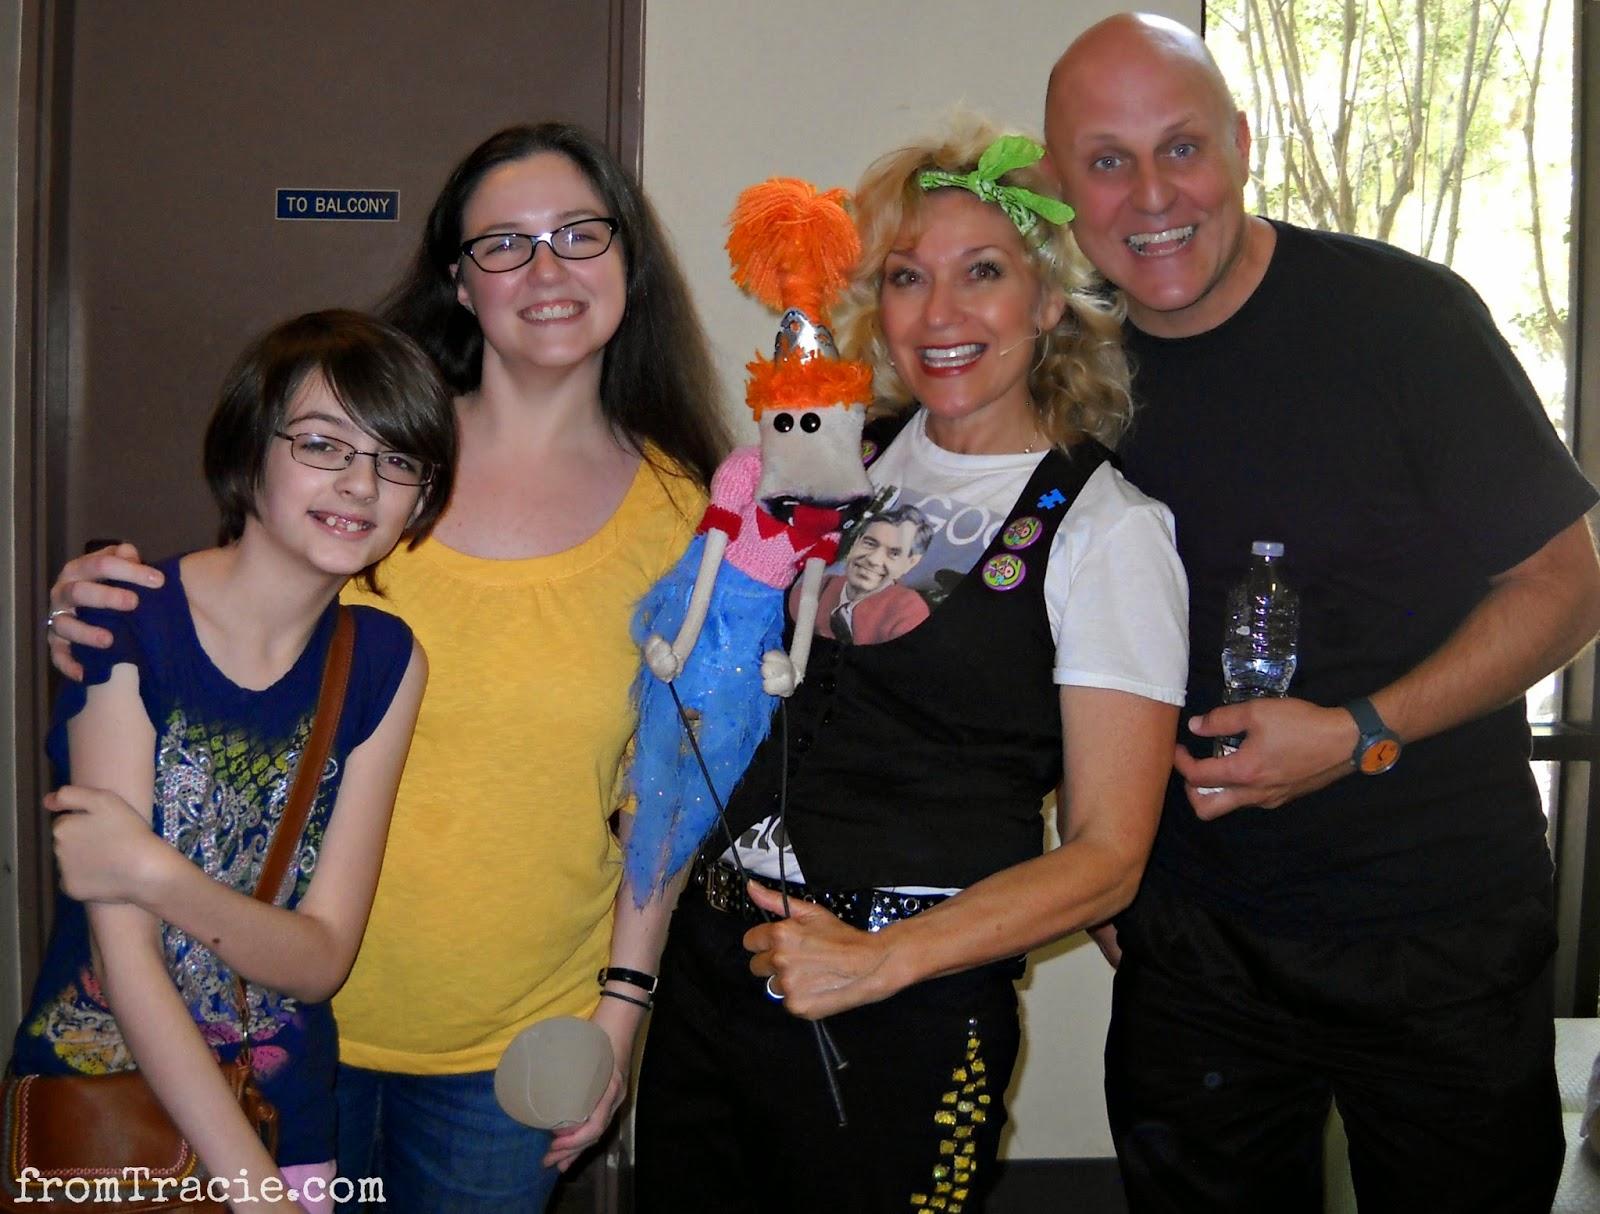 Tracie and Katarina with Leslie Carrara-Rudolph and John DeHaas